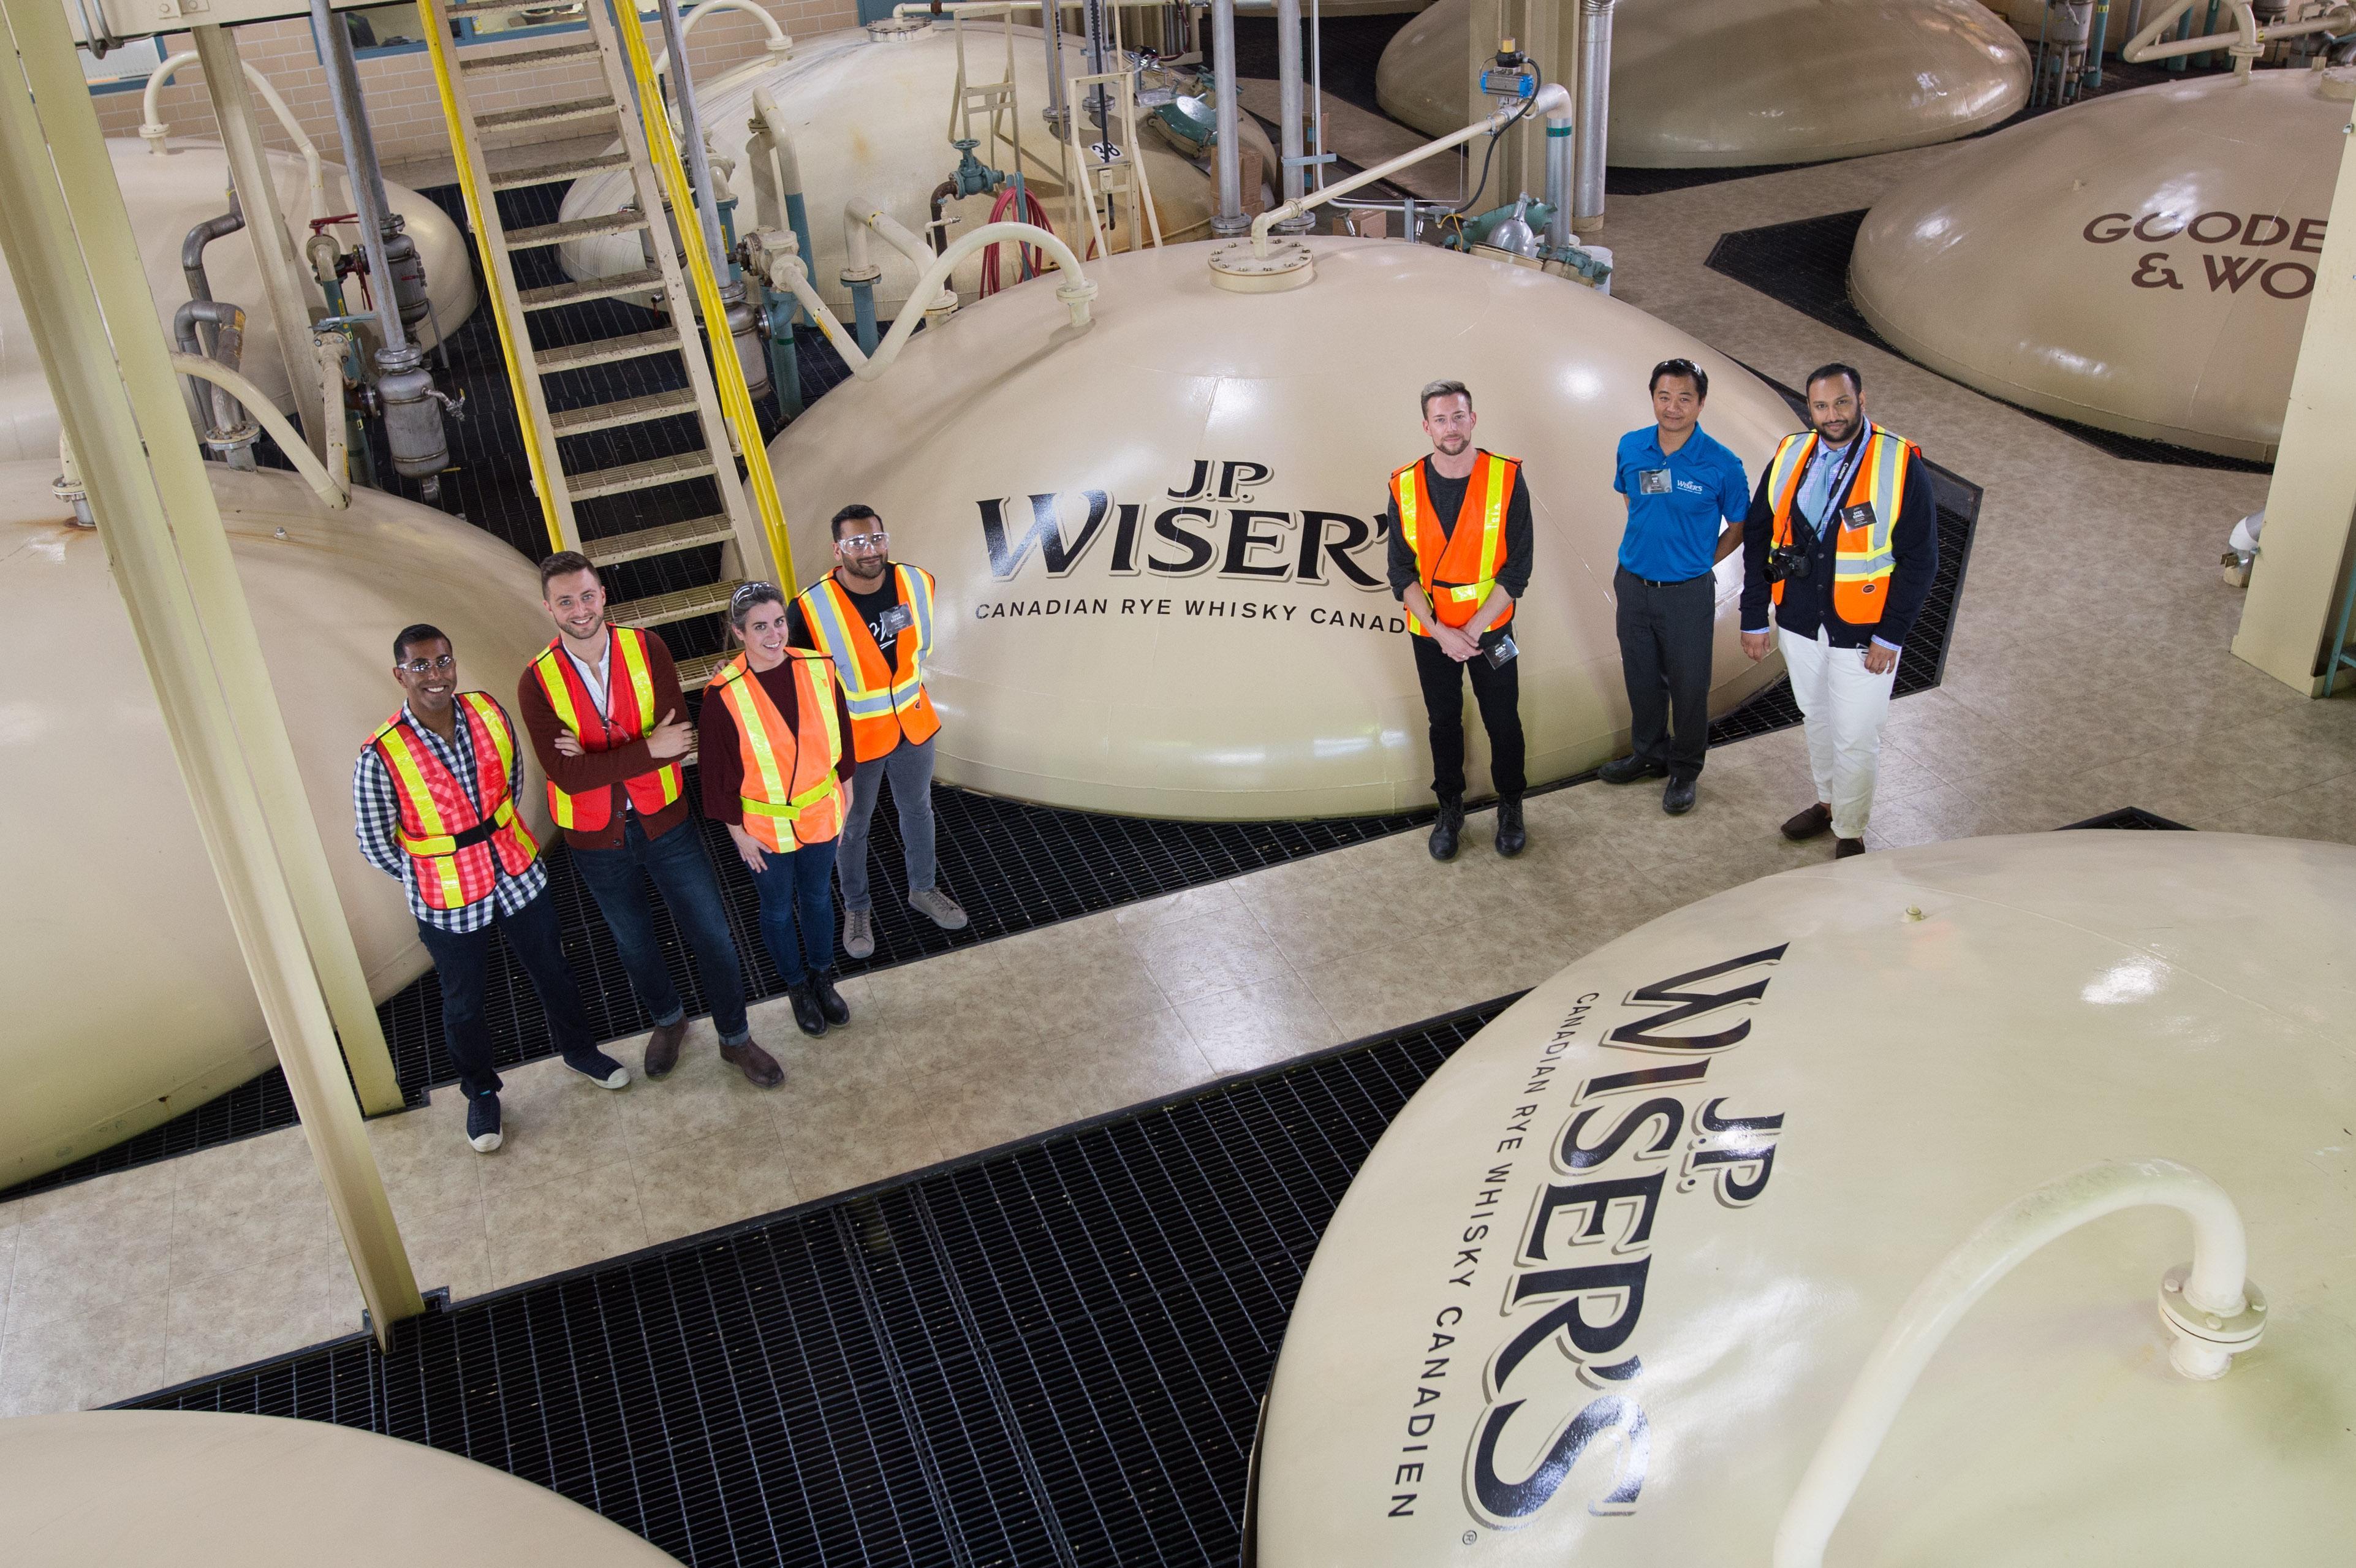 J.P. Wiser's tour